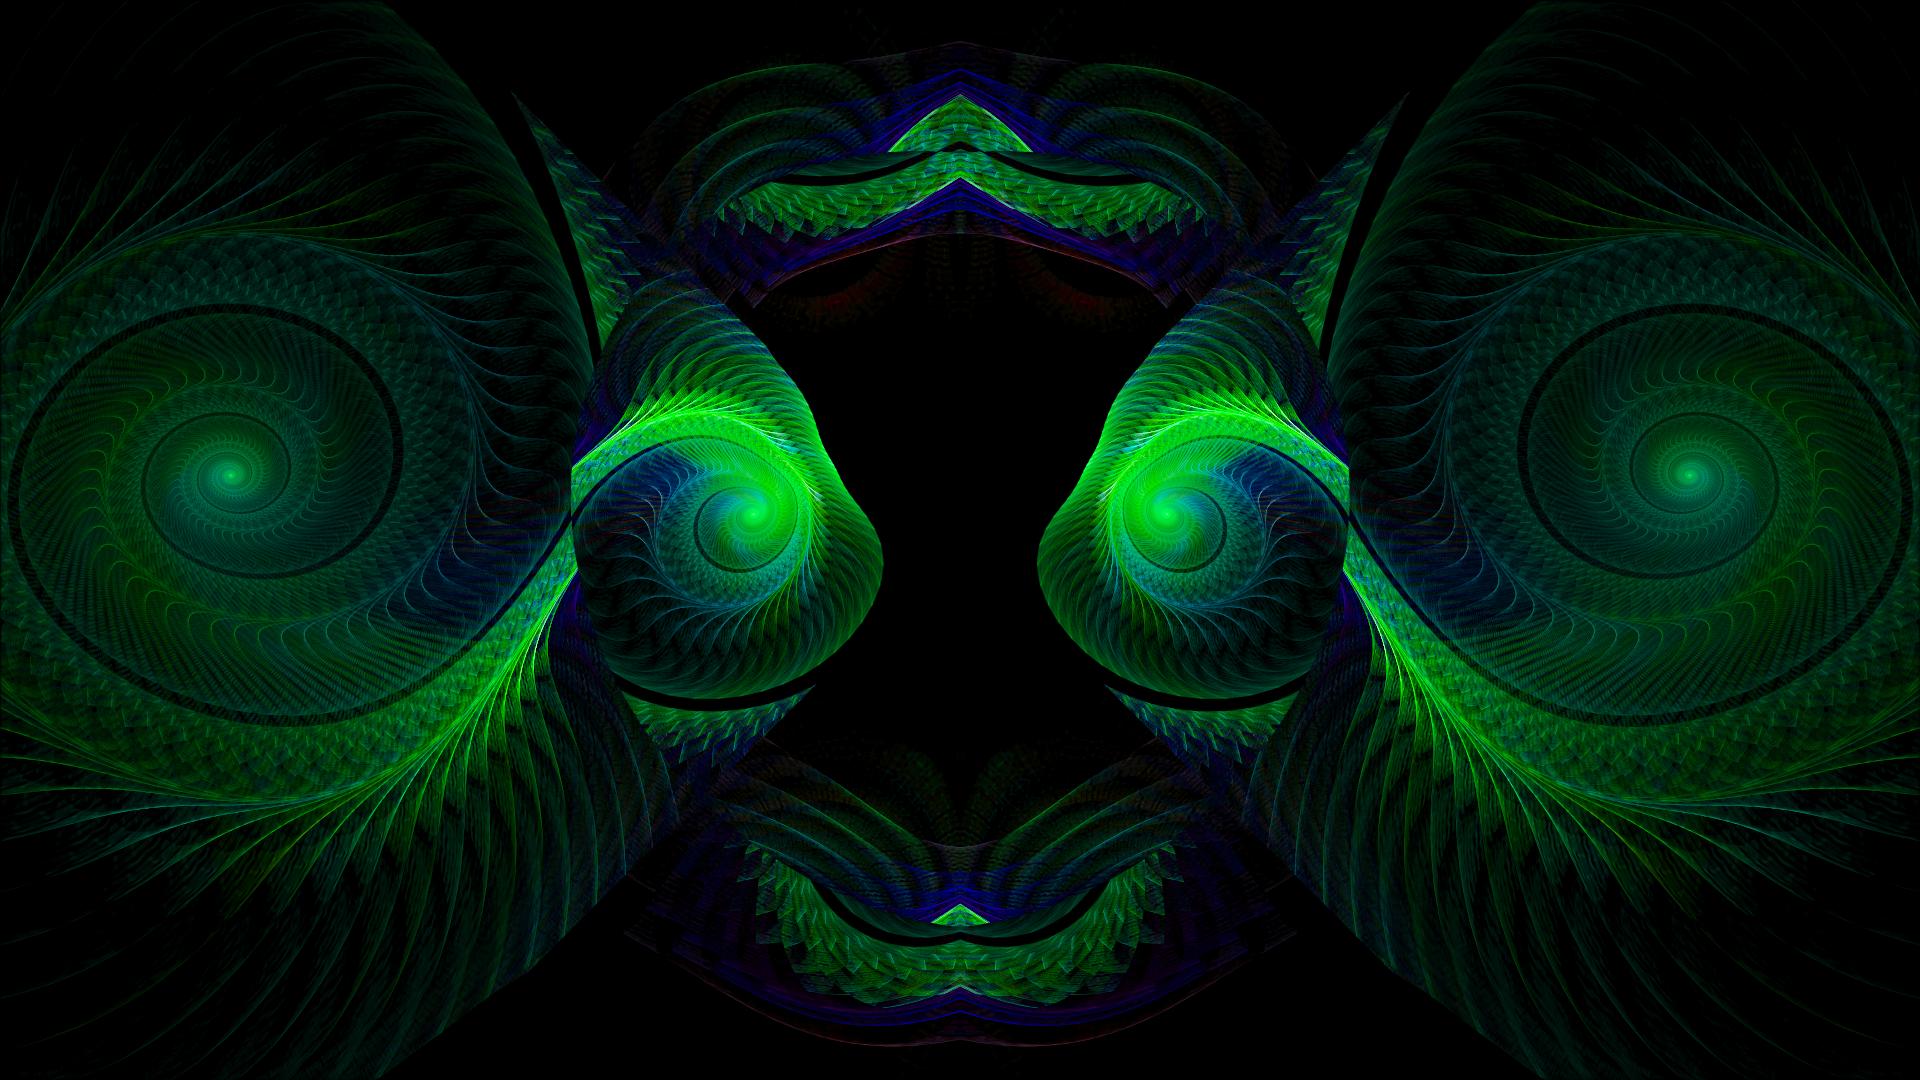 Hypnokitty by Fractamonium